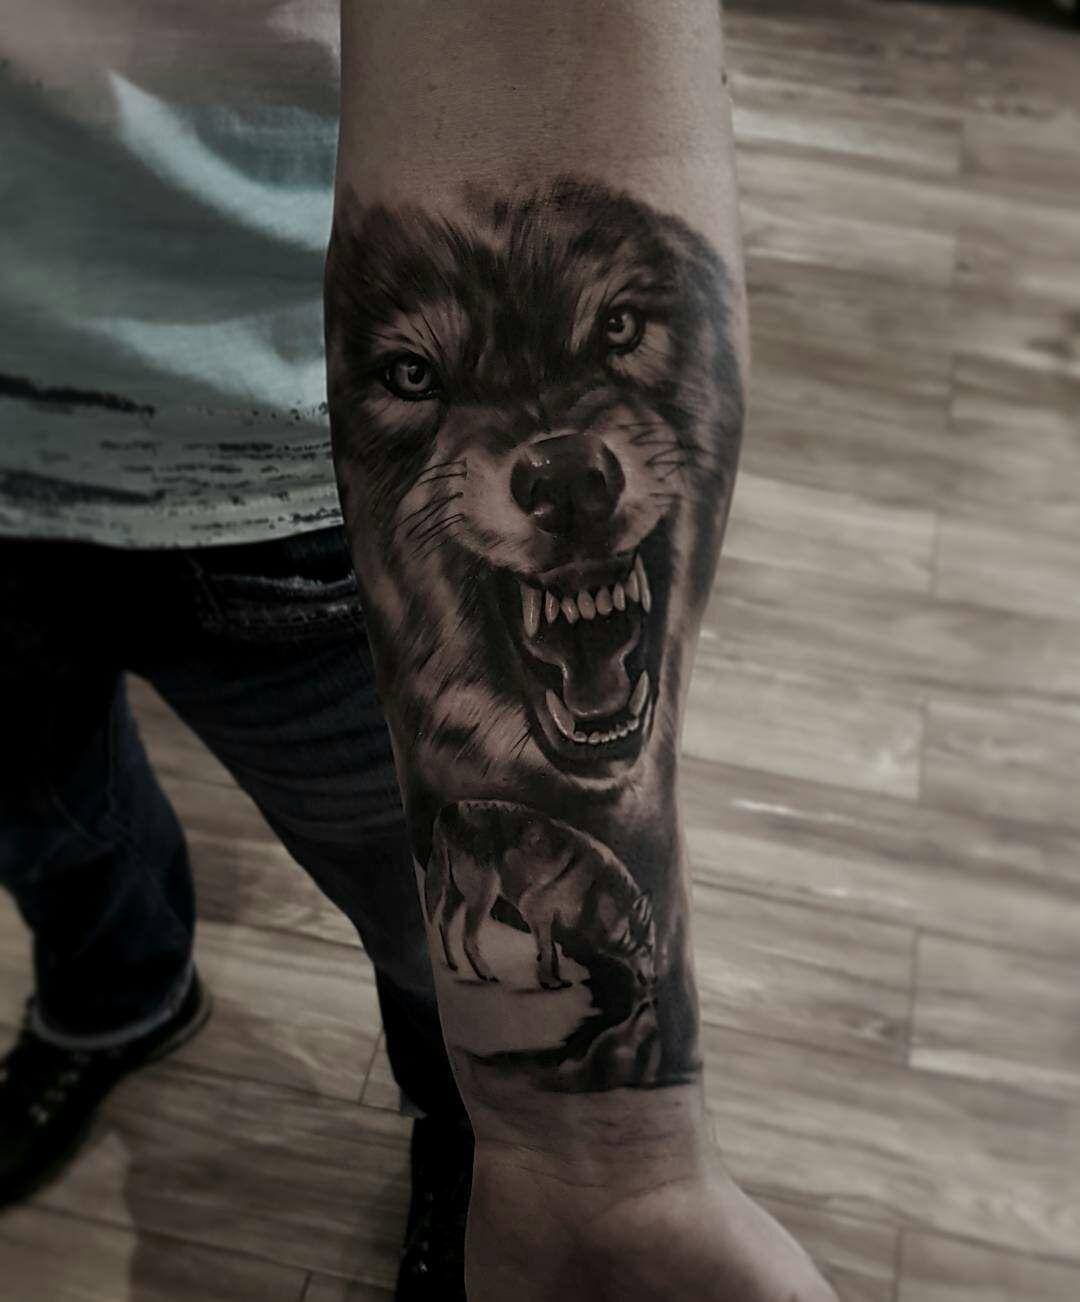 Pin De Norma Guzman En Tatuajes Pinterest Tatuagem Tatuagem